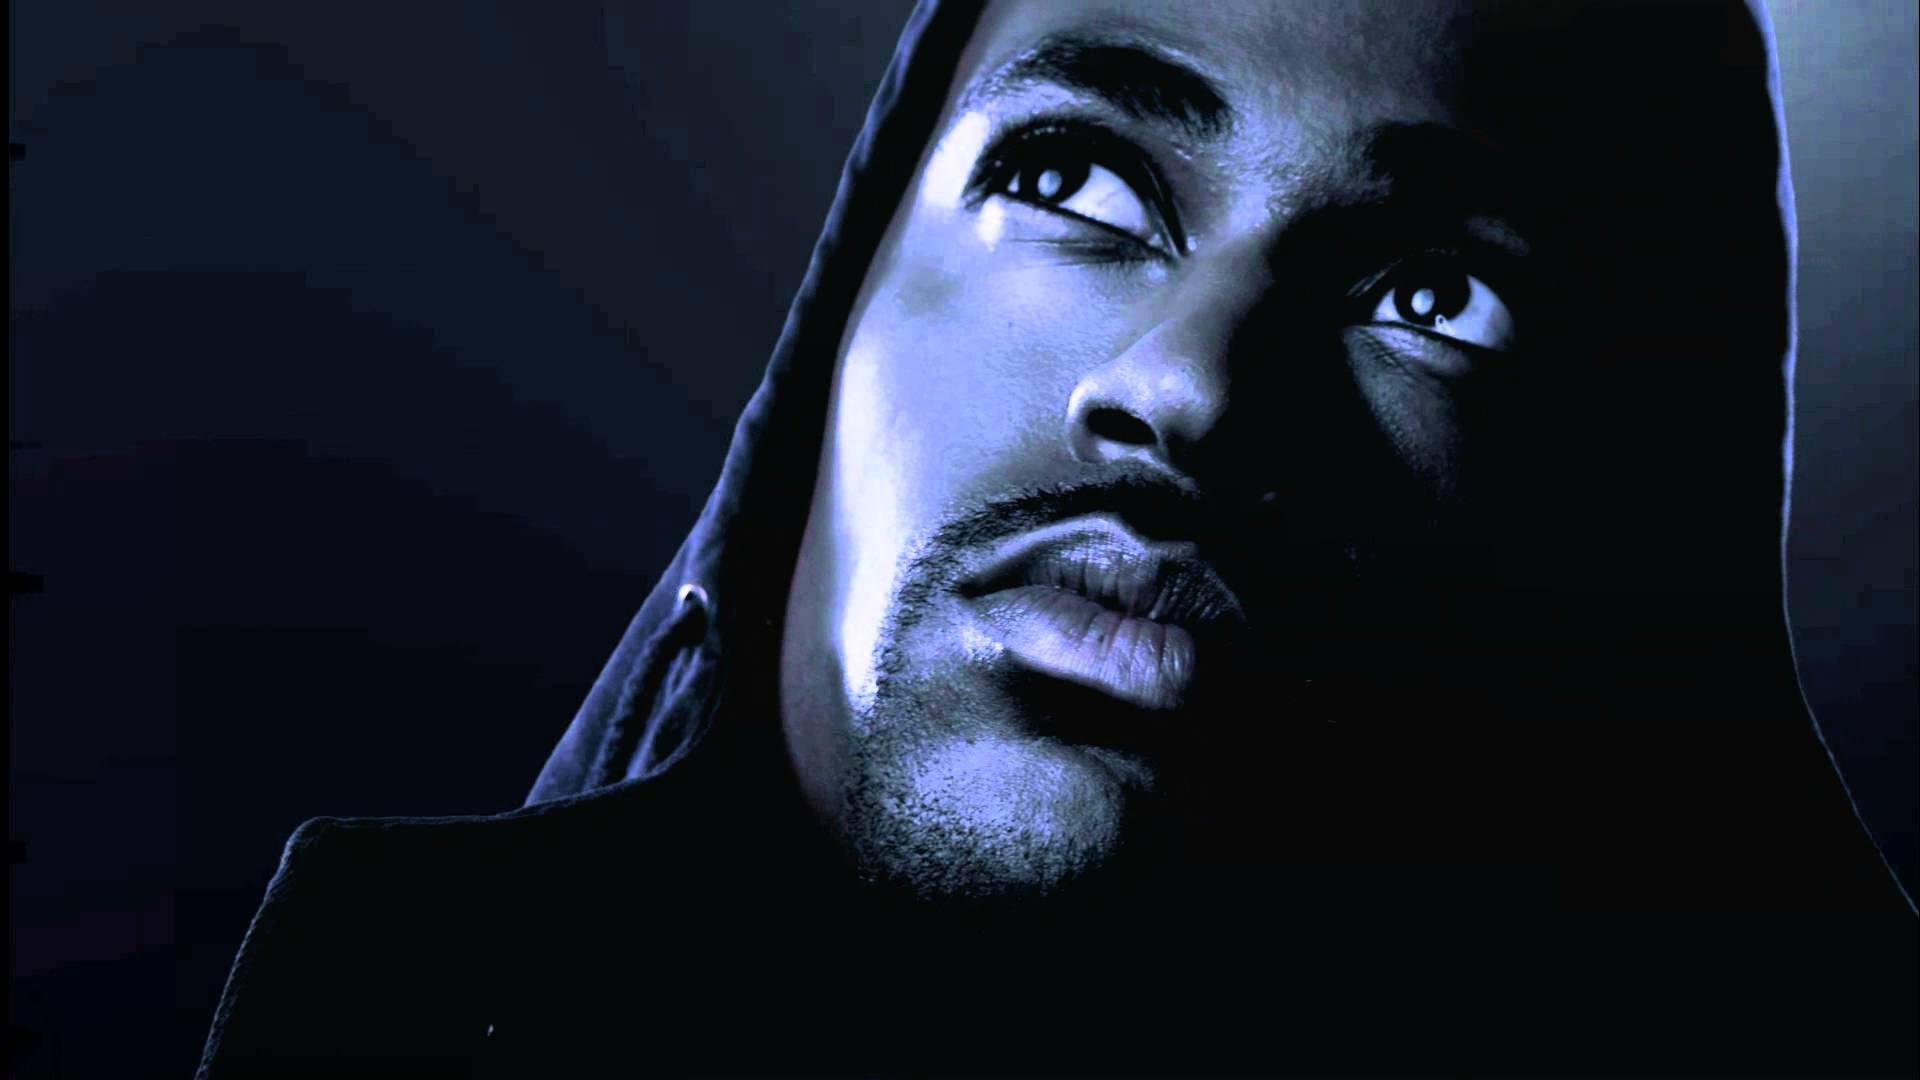 Big Sean Makes Announcement About His Album